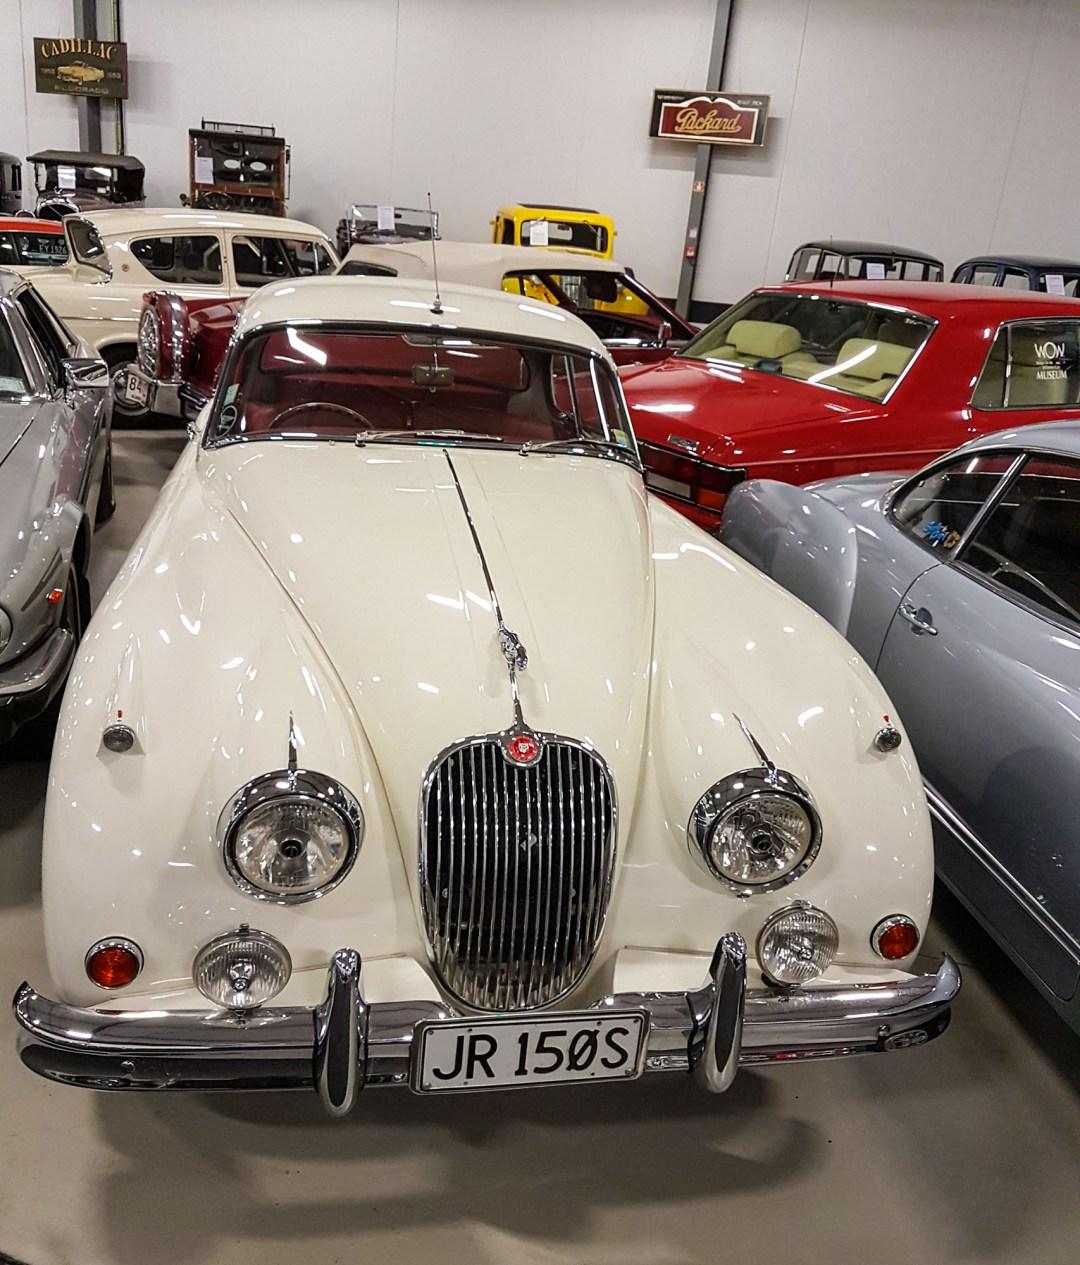 Jaguar Mark II at WOW Classic Cars for boomervoice